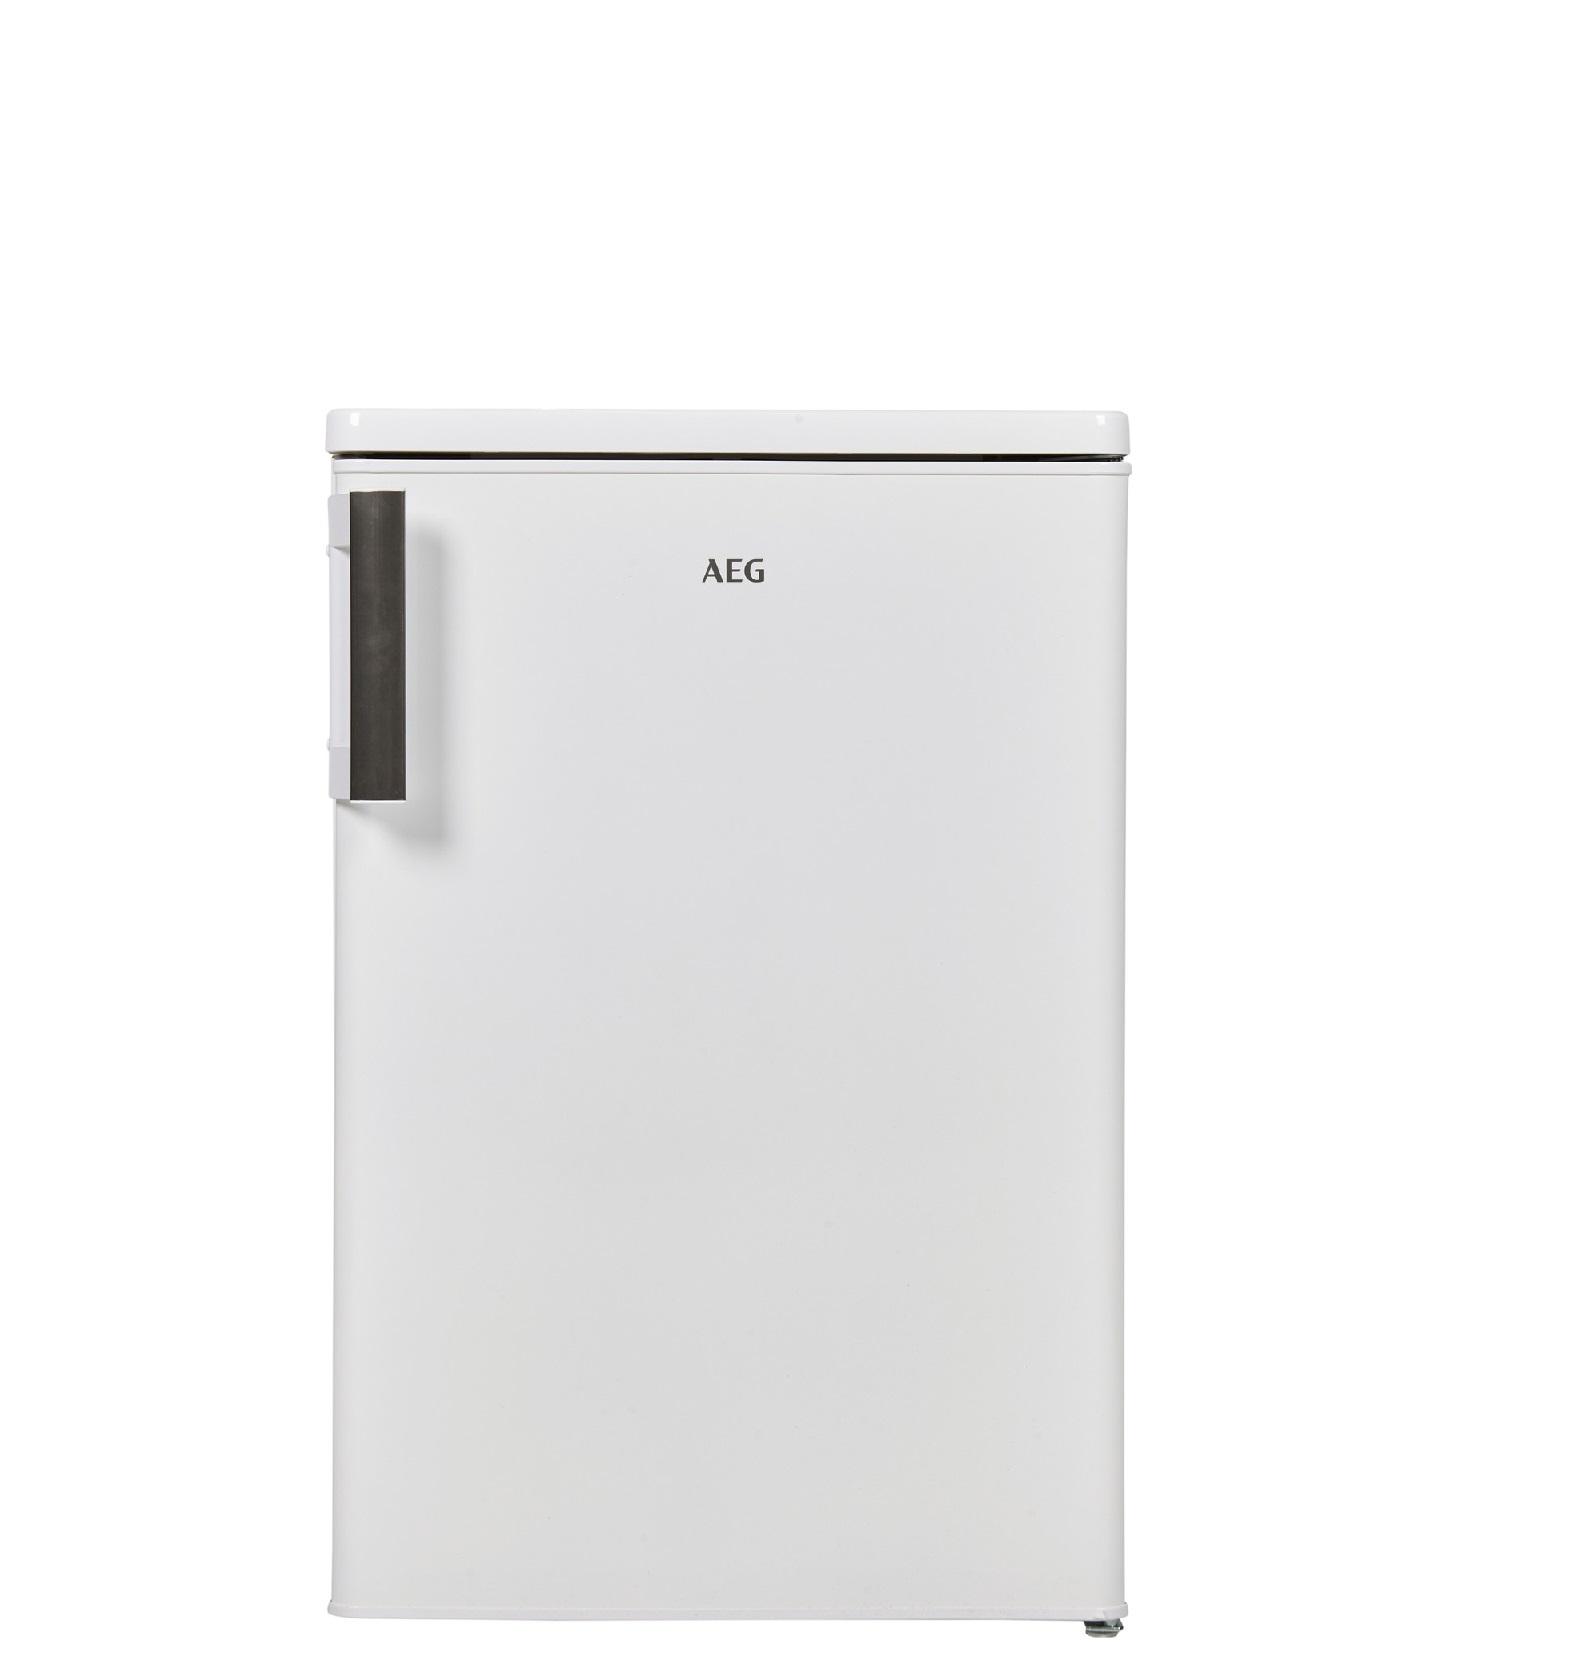 Verrassend AEG RTB51511AW Koeler - Elektro Witgoed Outlet Apeldoorn XQ-11